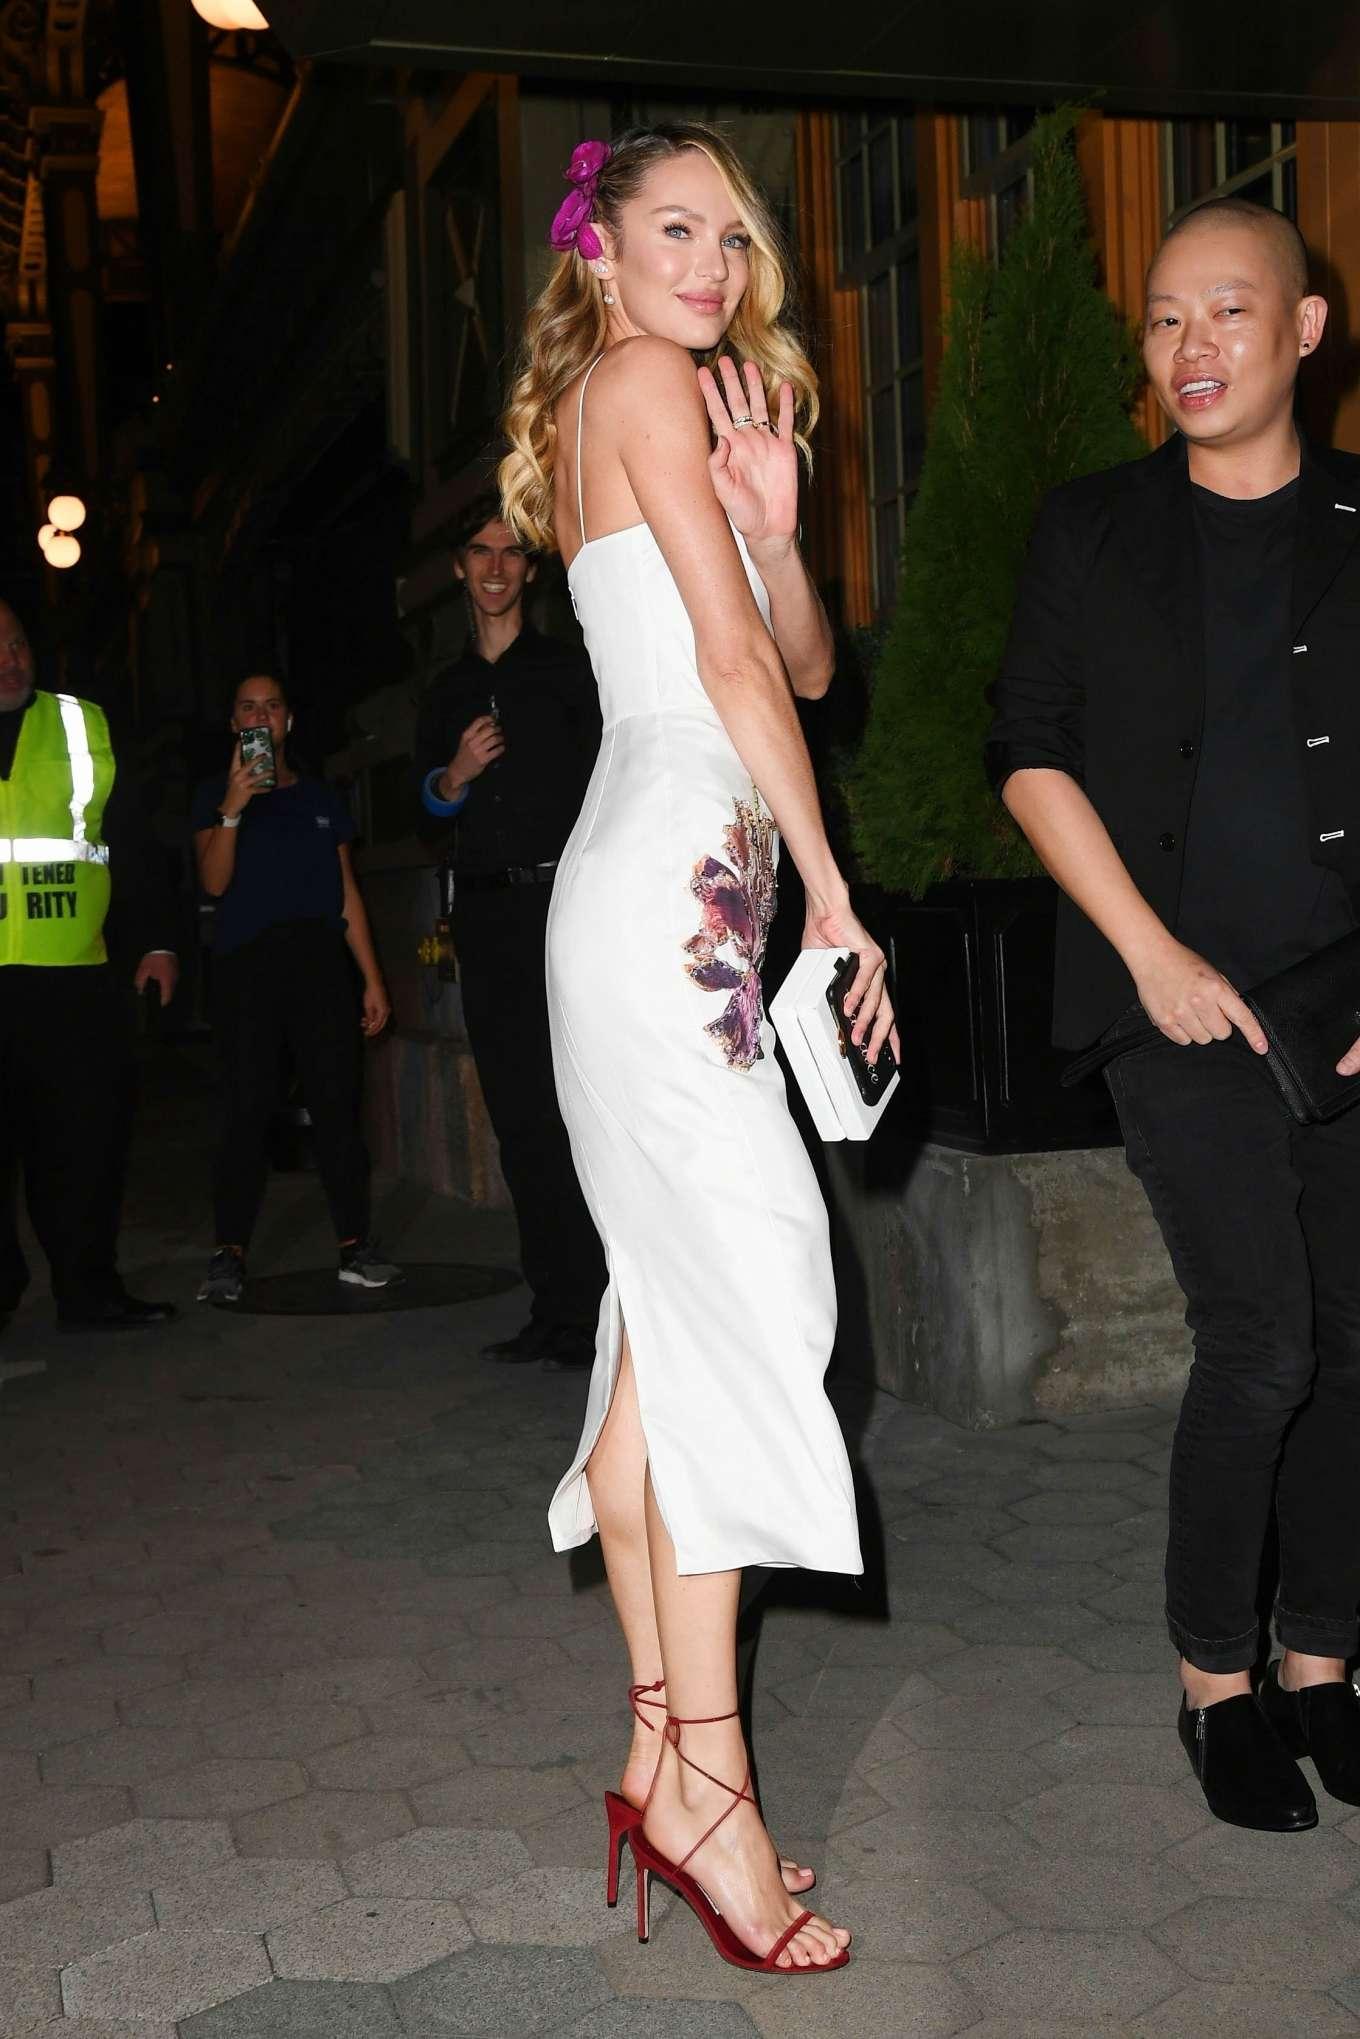 Candice Swanepoel 2019 : Candice Swanepoel – Arrives at CFDA Vogue Fashion Fund 2019 Awards-05